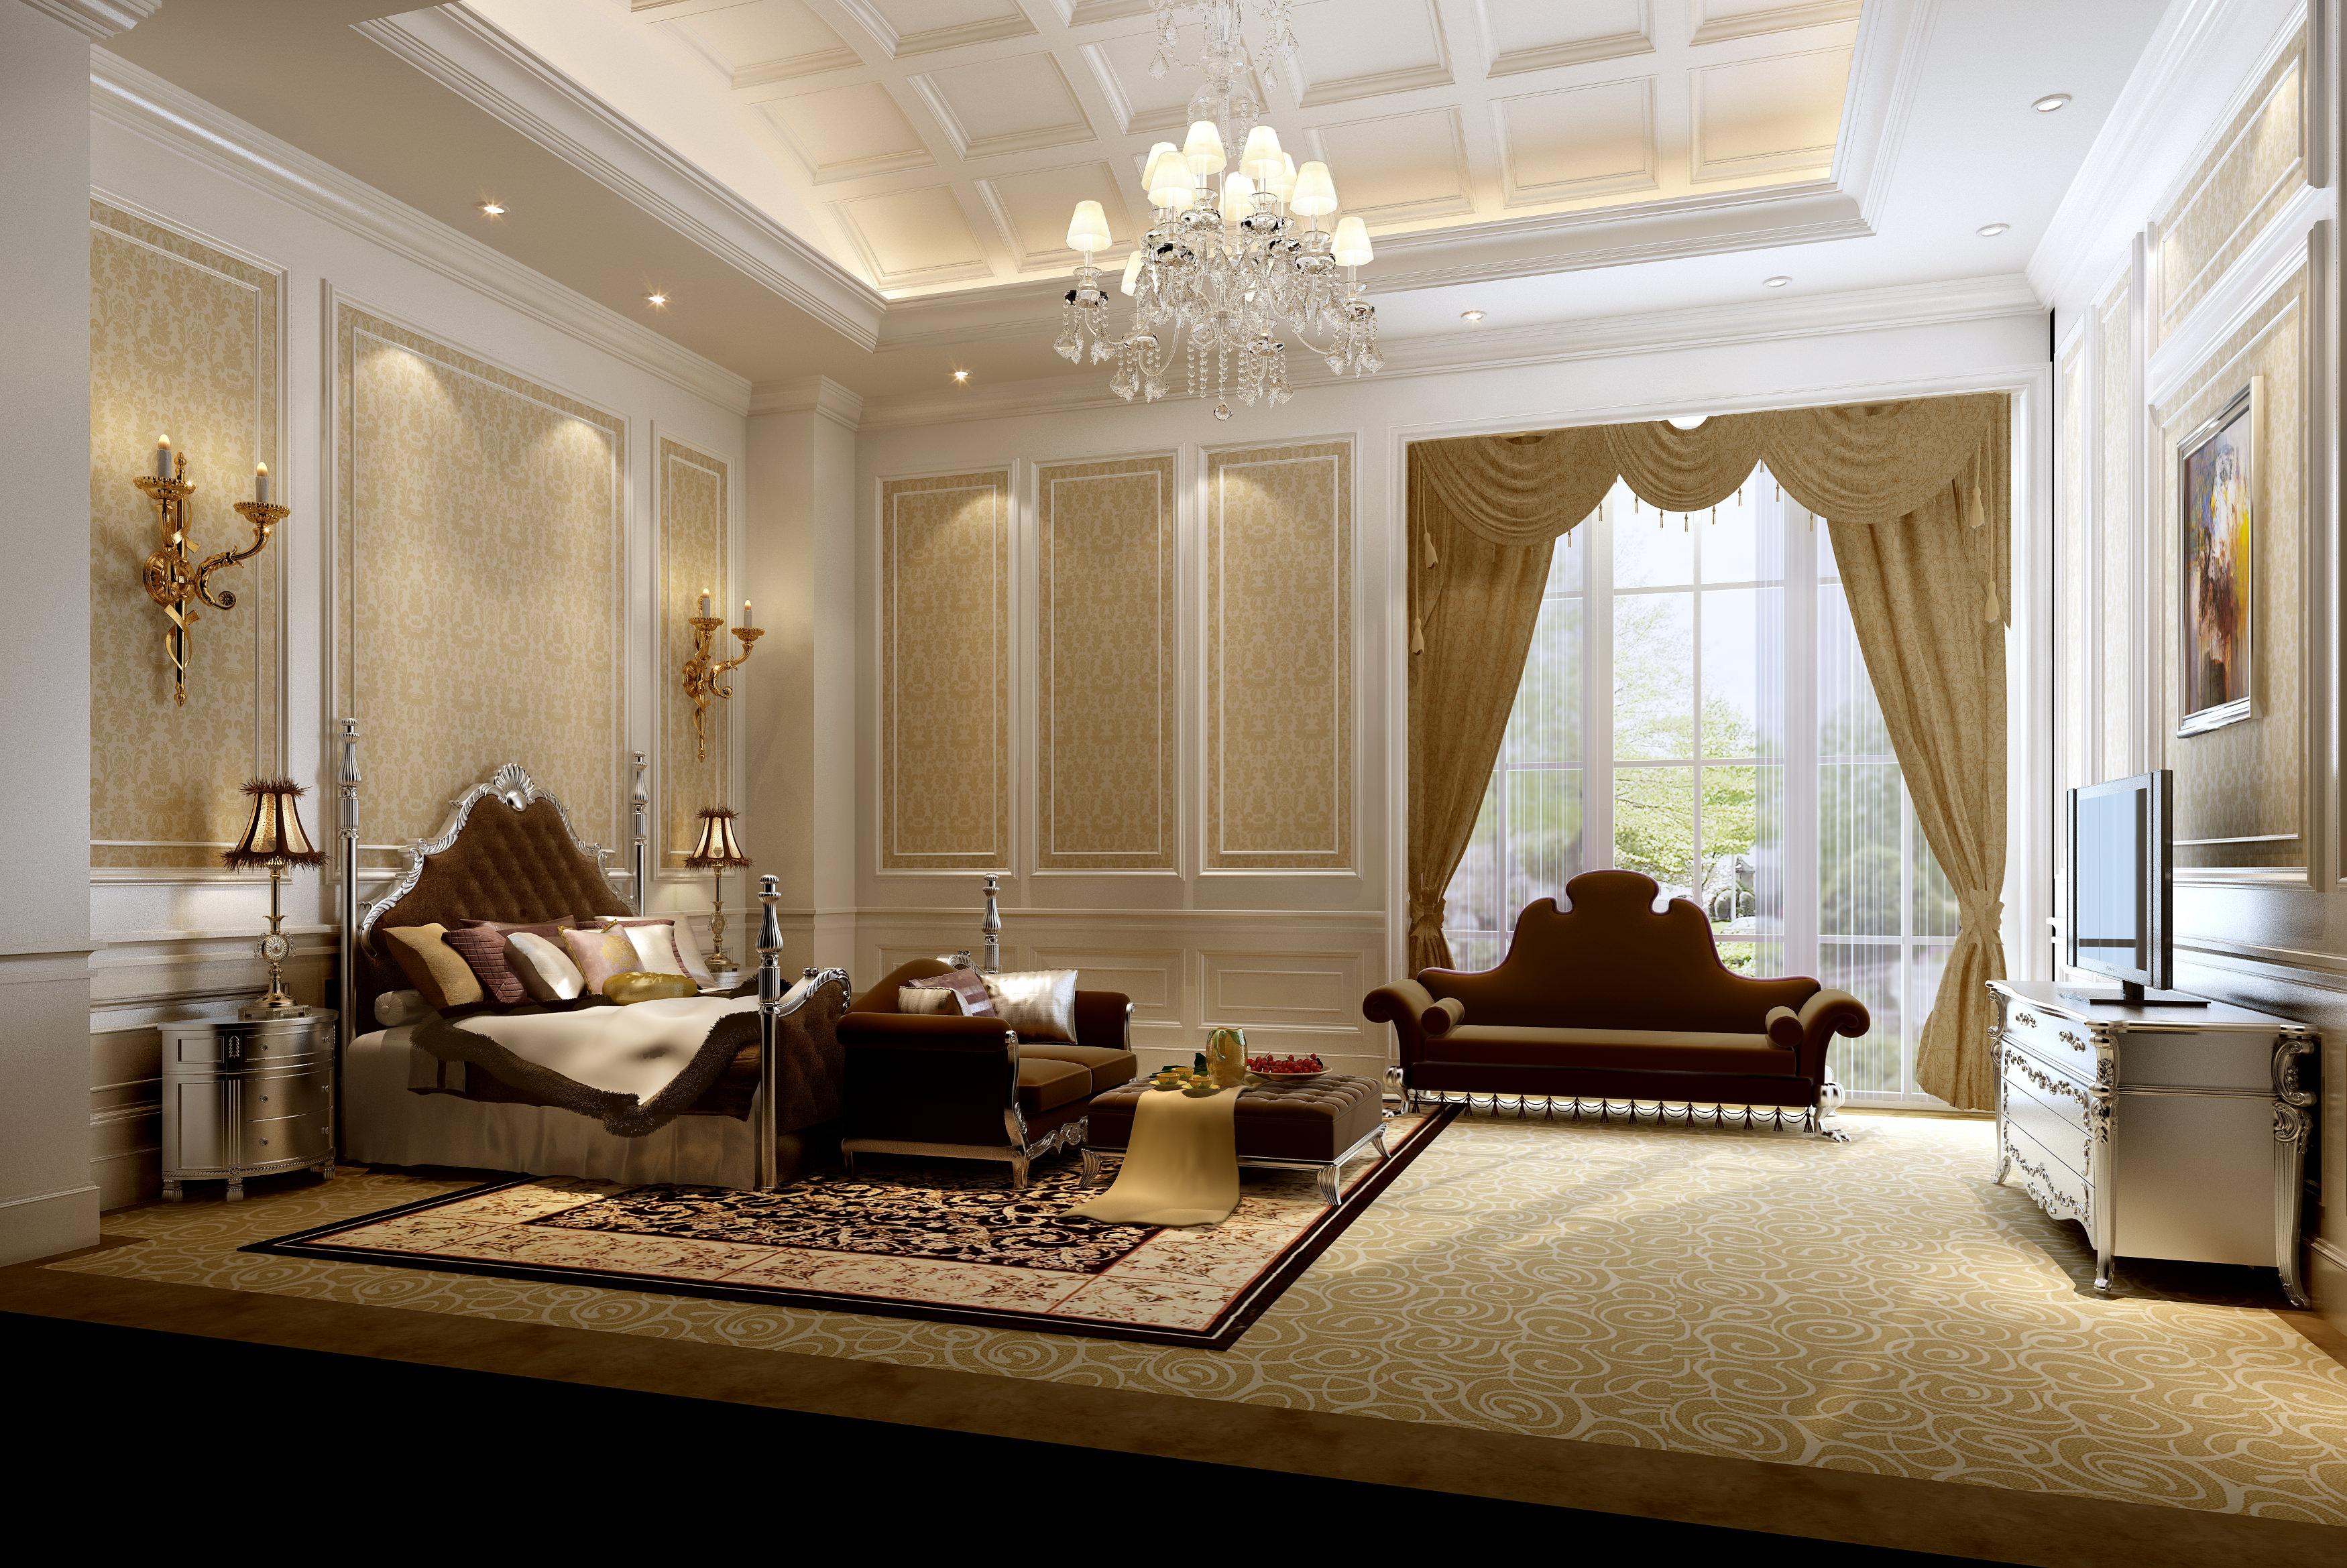 Model Bedroom very luxury bedroom 3d model | cgtrader